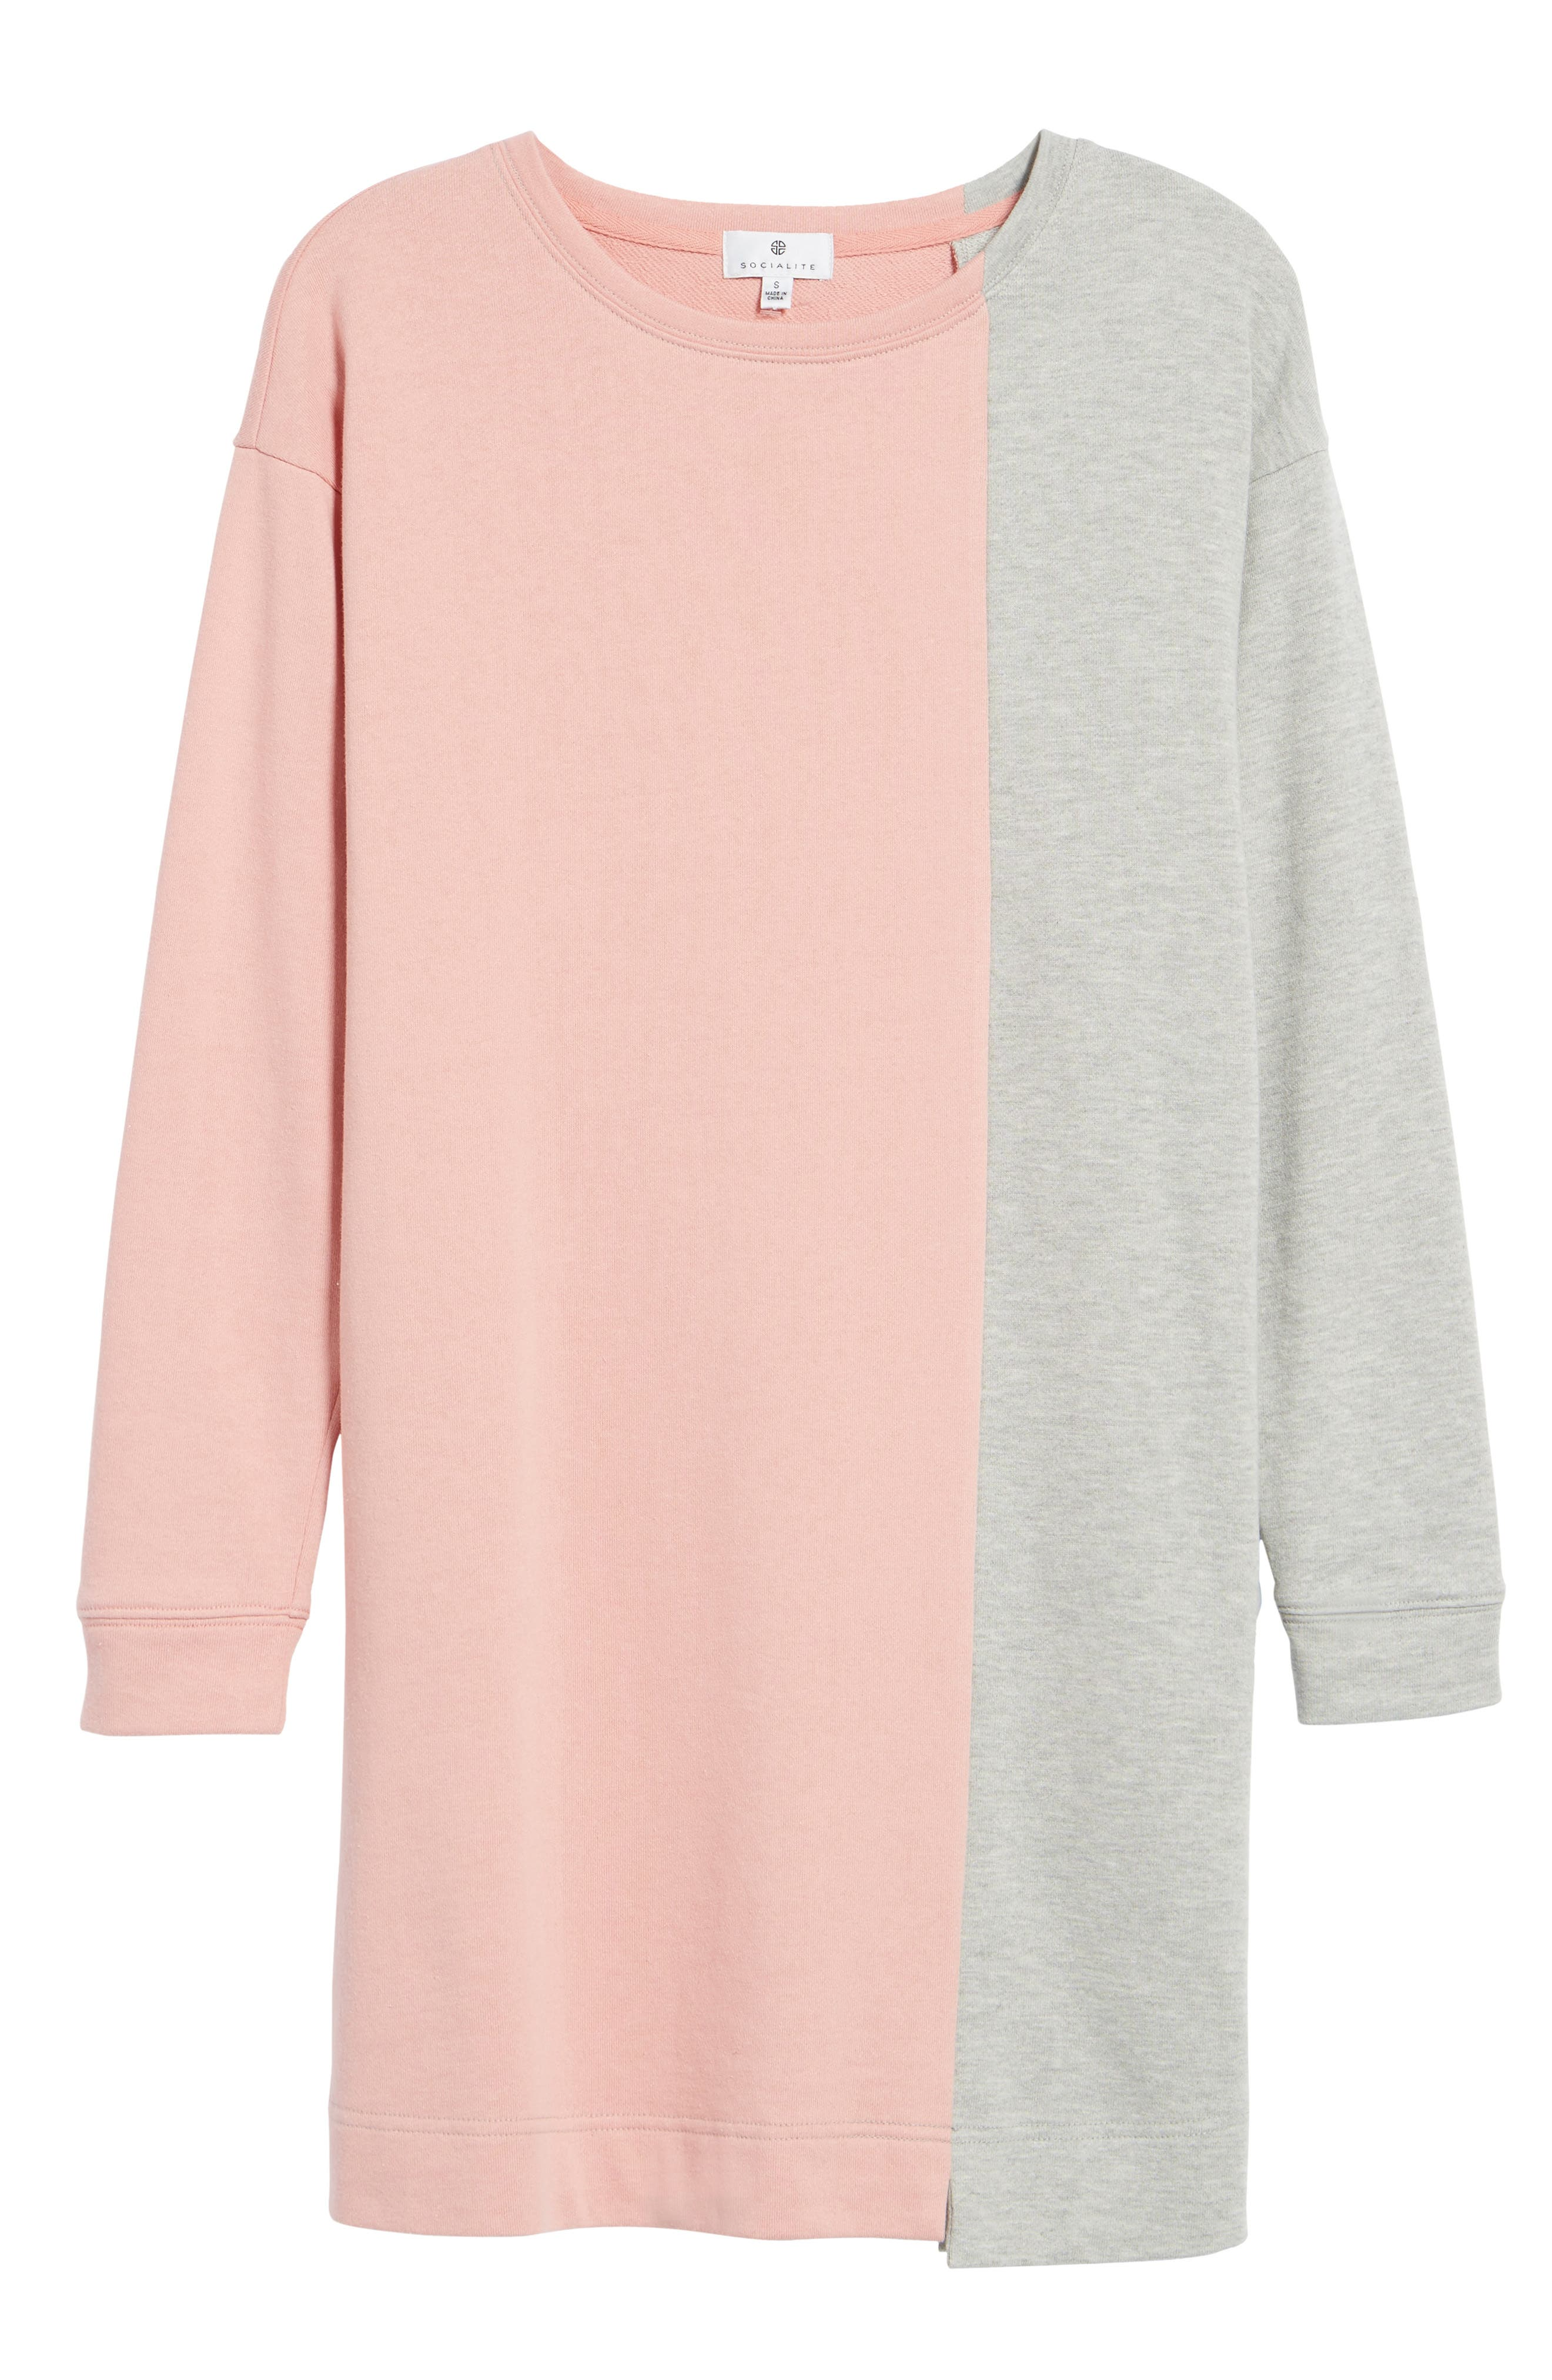 Colorblock Sweatshirt Dress,                             Alternate thumbnail 6, color,                             039